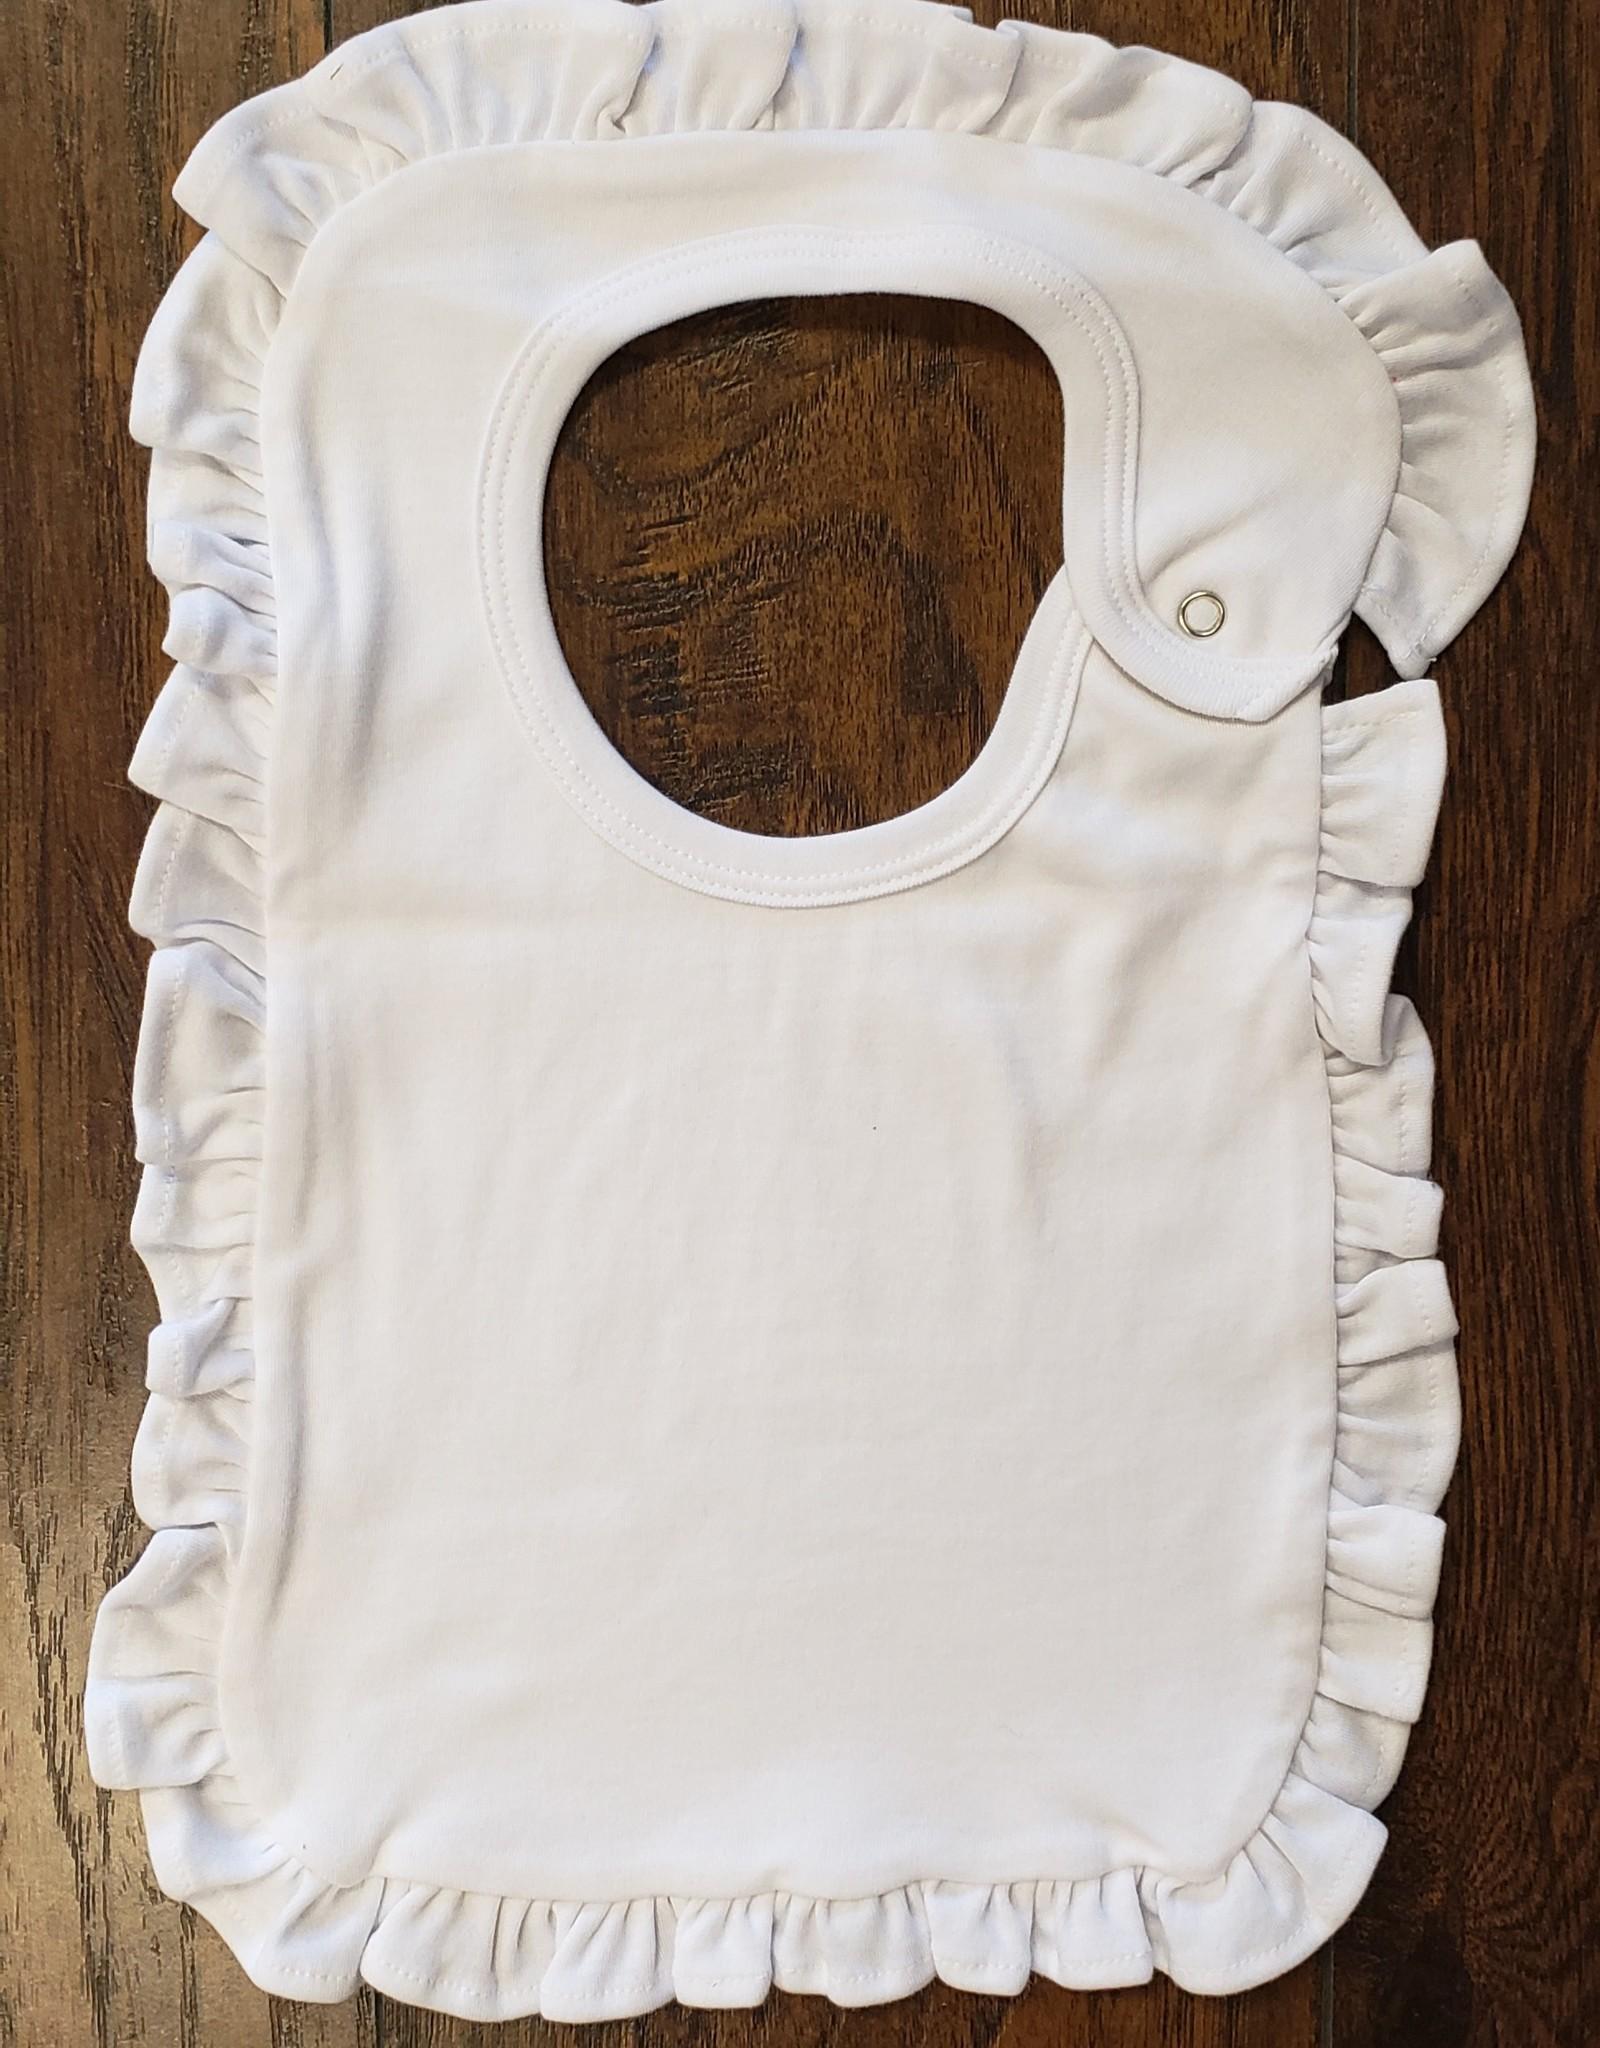 Monag White 100% Cotton Bib with Ruffles